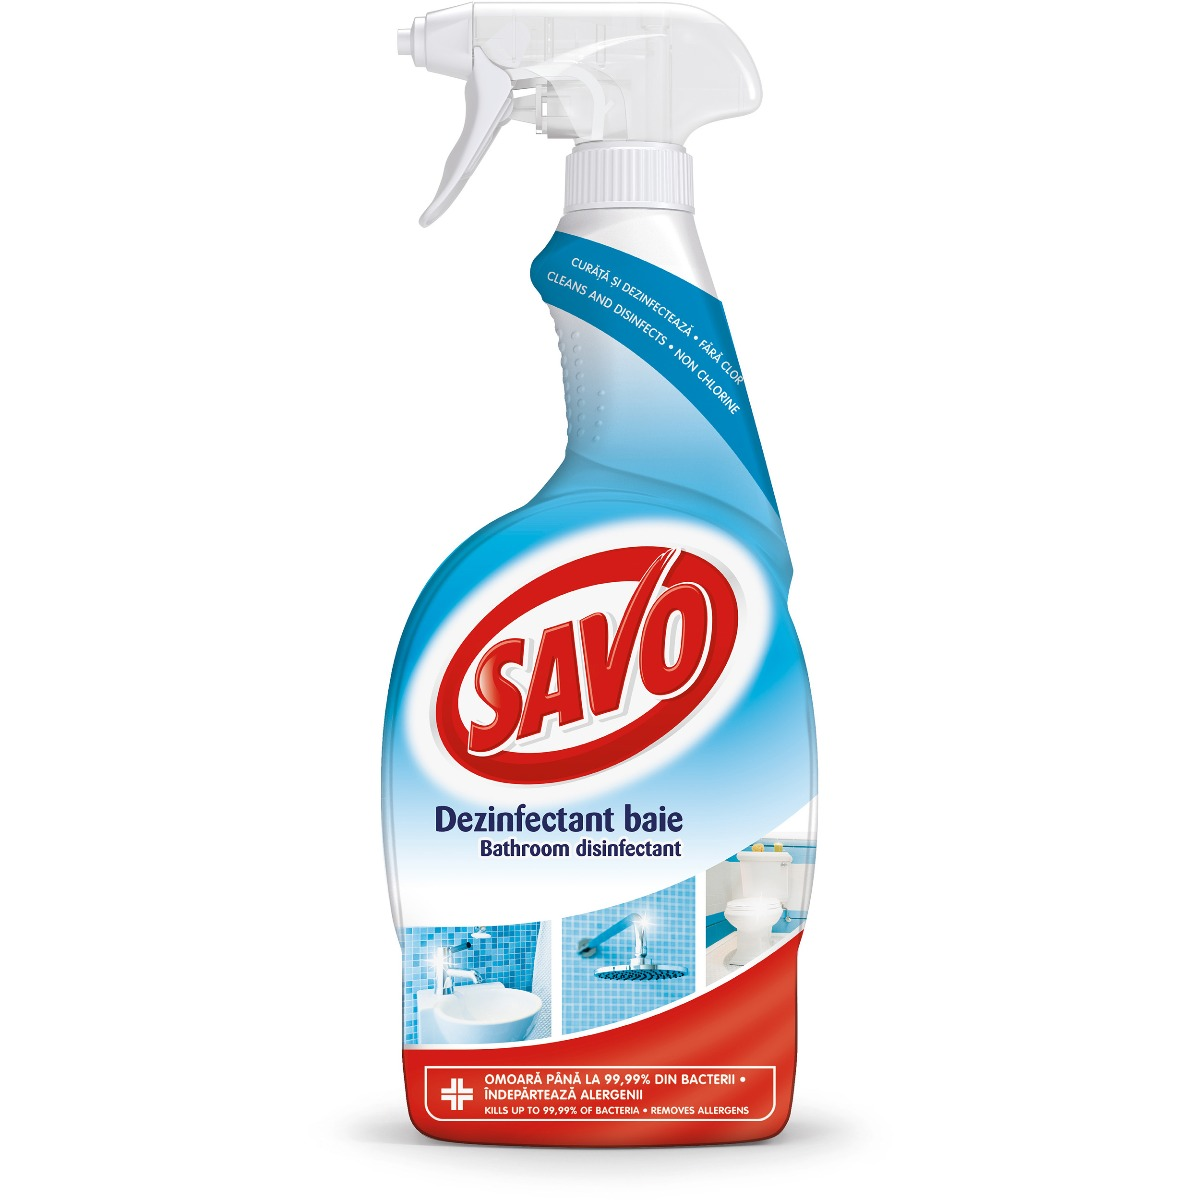 Spray dezinfectant fara clor pentru baie Savo, 650 ml imagine